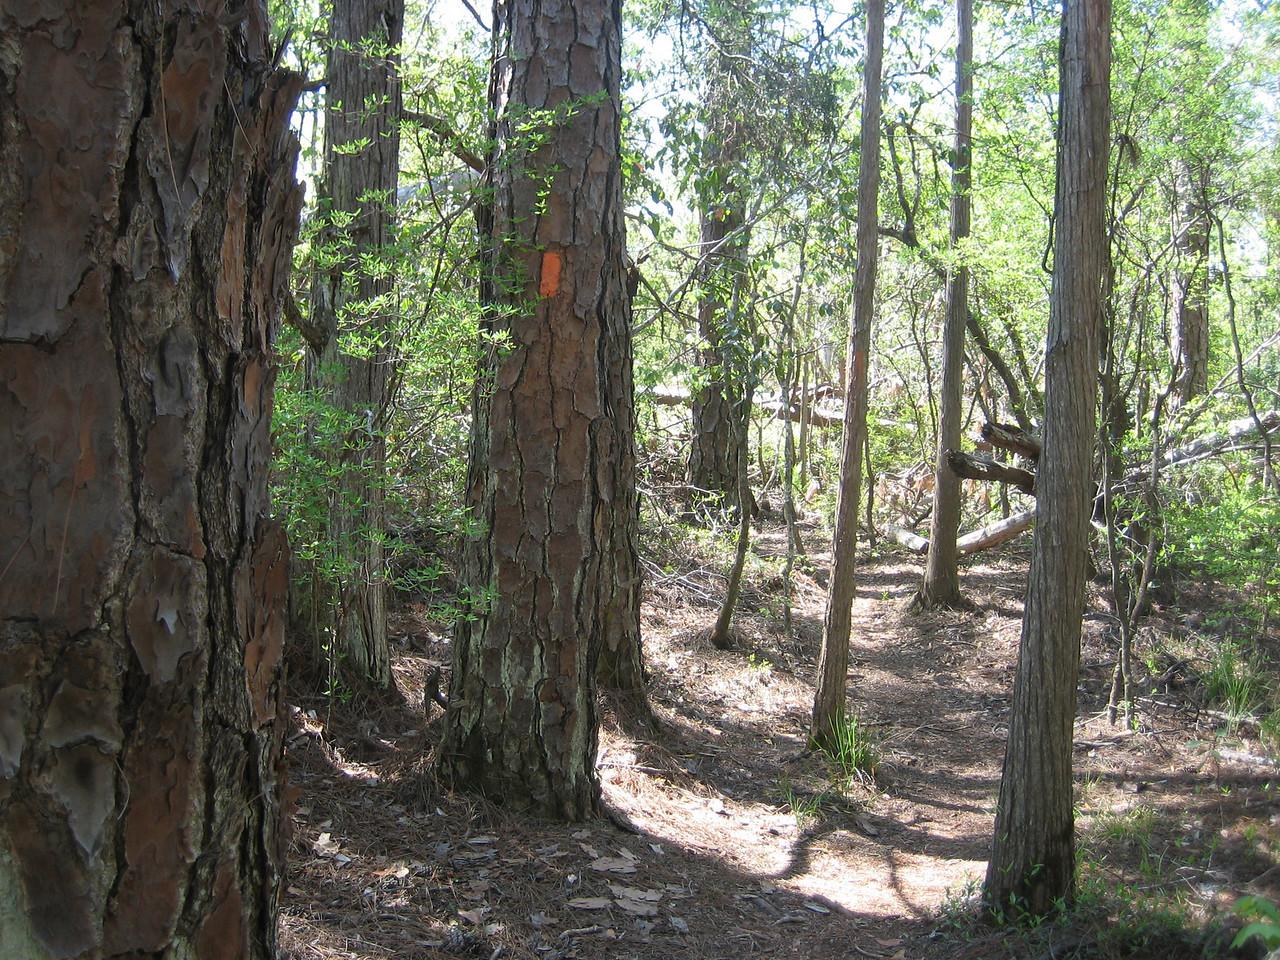 Following the orange blazes<br /> PHOTO CREDIT: Sandra Friend / Florida Trail Association